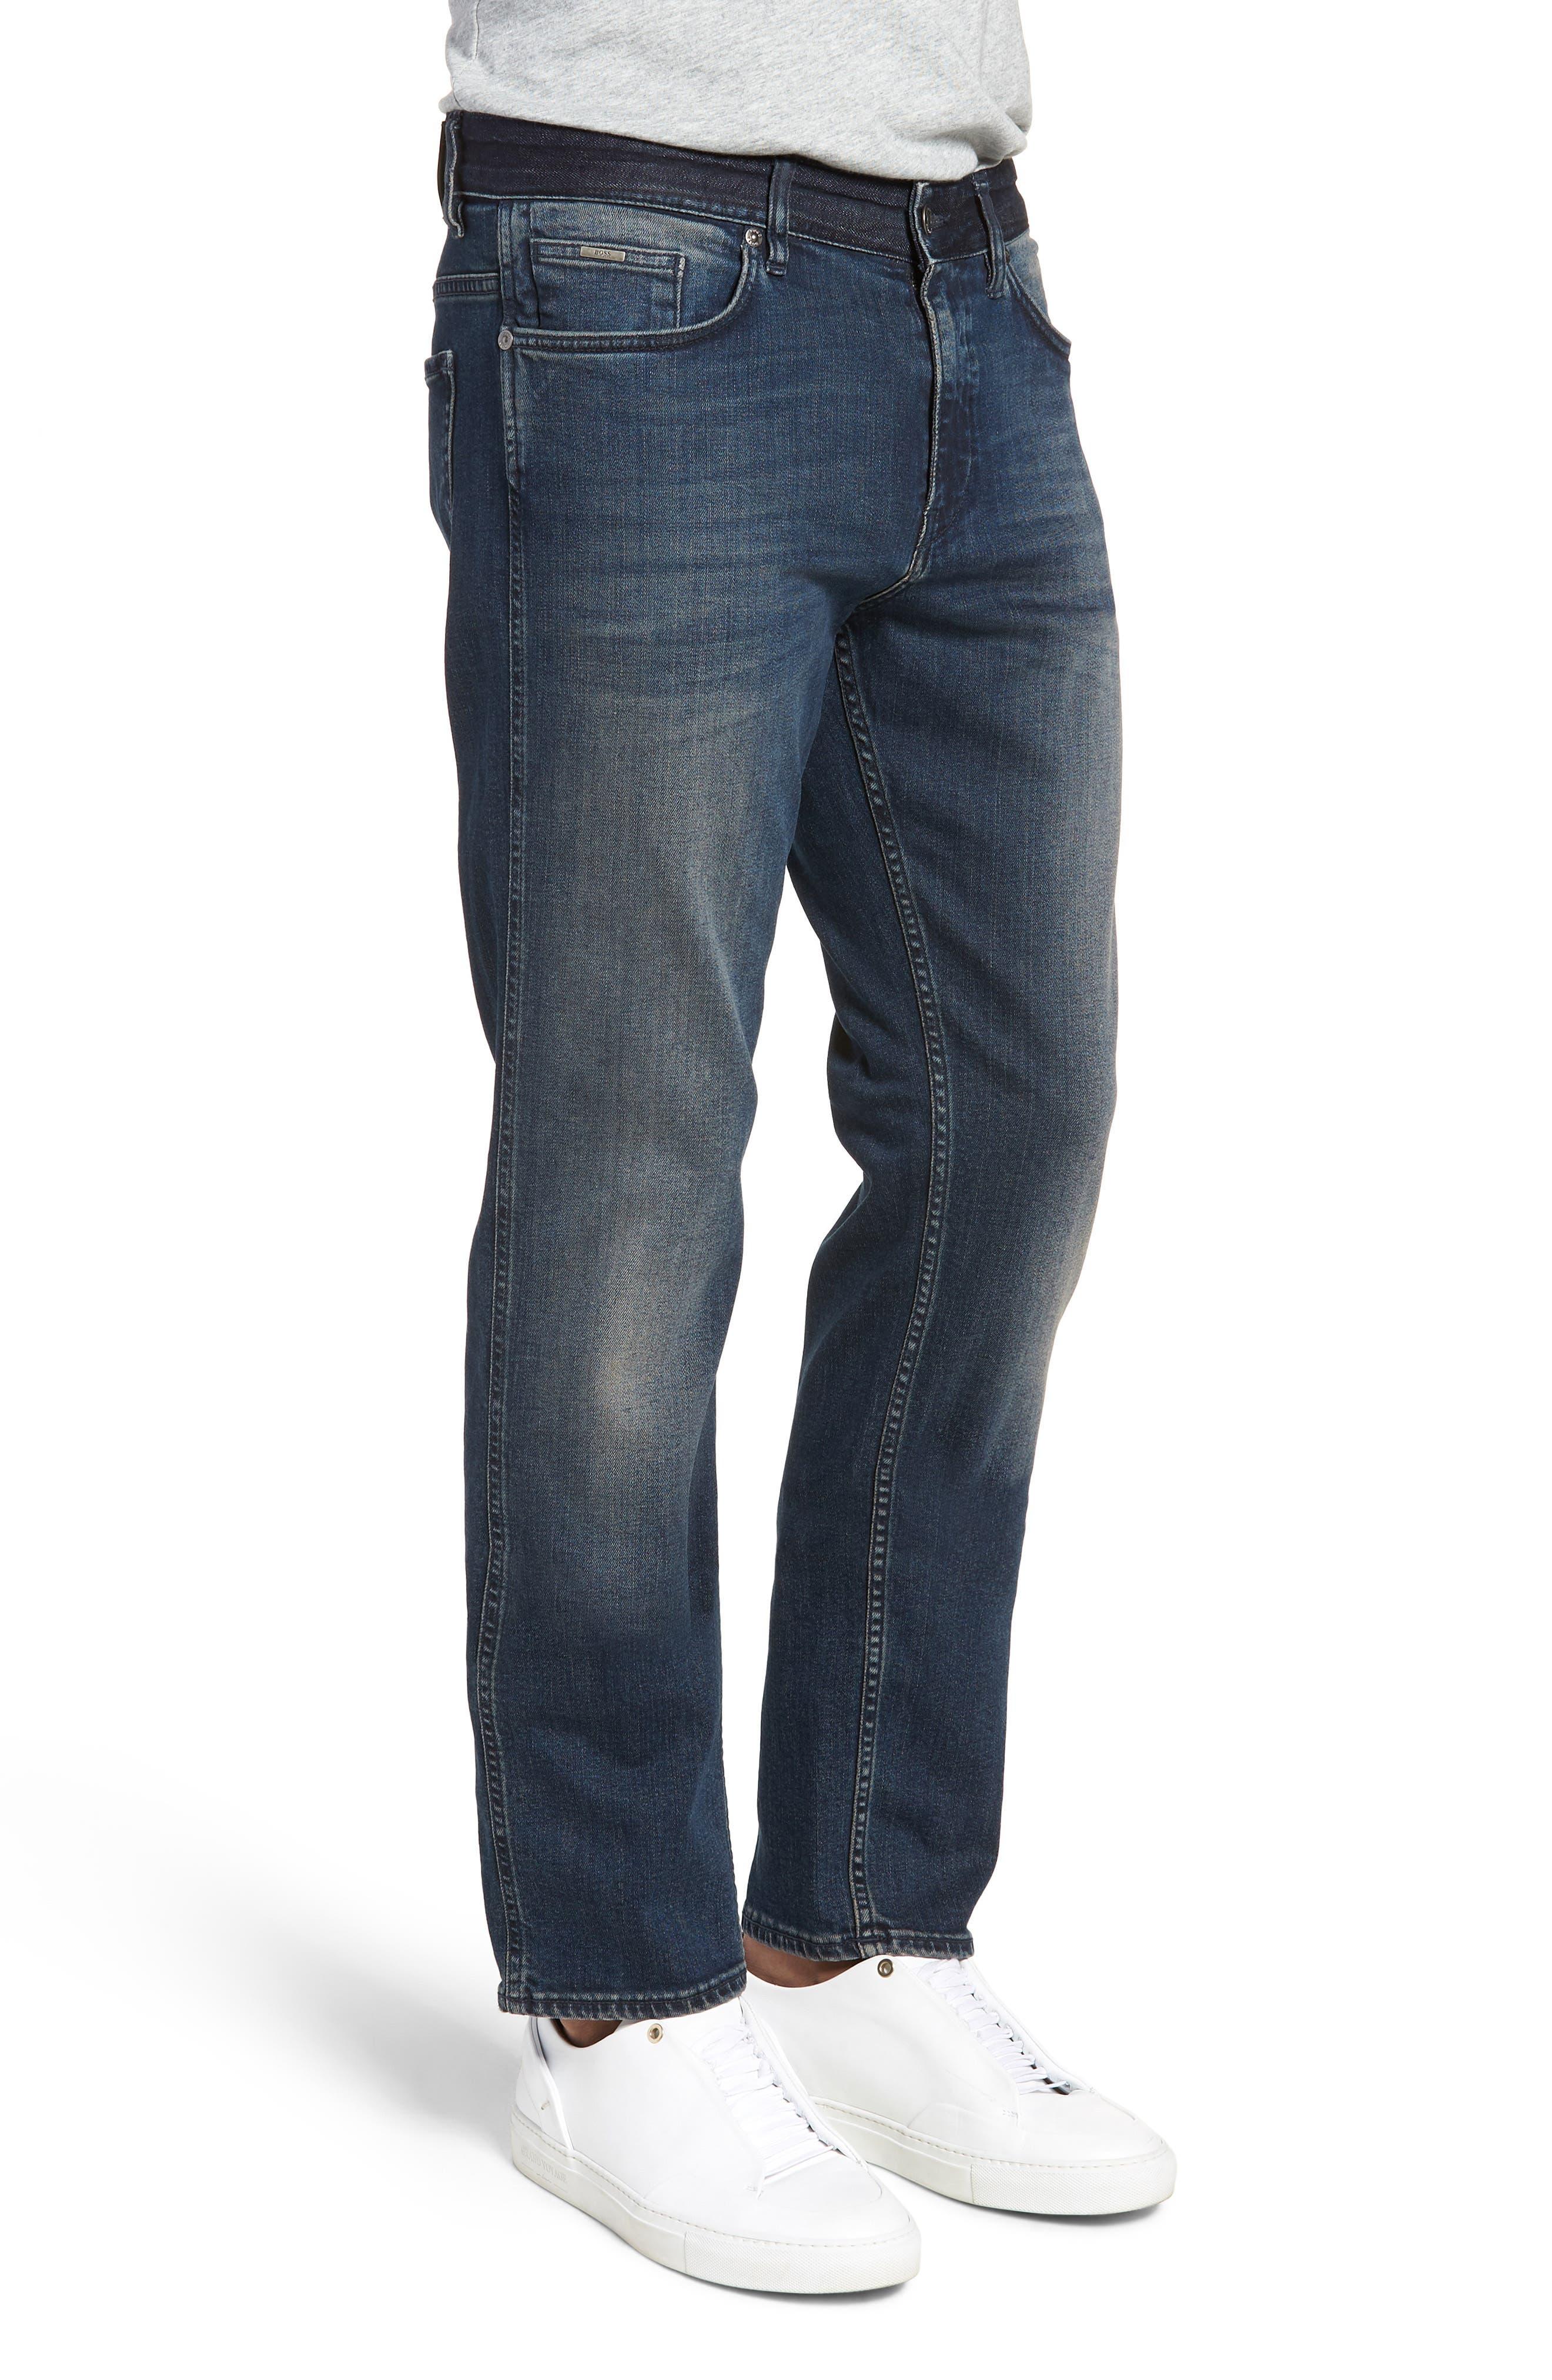 Delaware Slim Fit Jeans,                             Alternate thumbnail 3, color,                             418